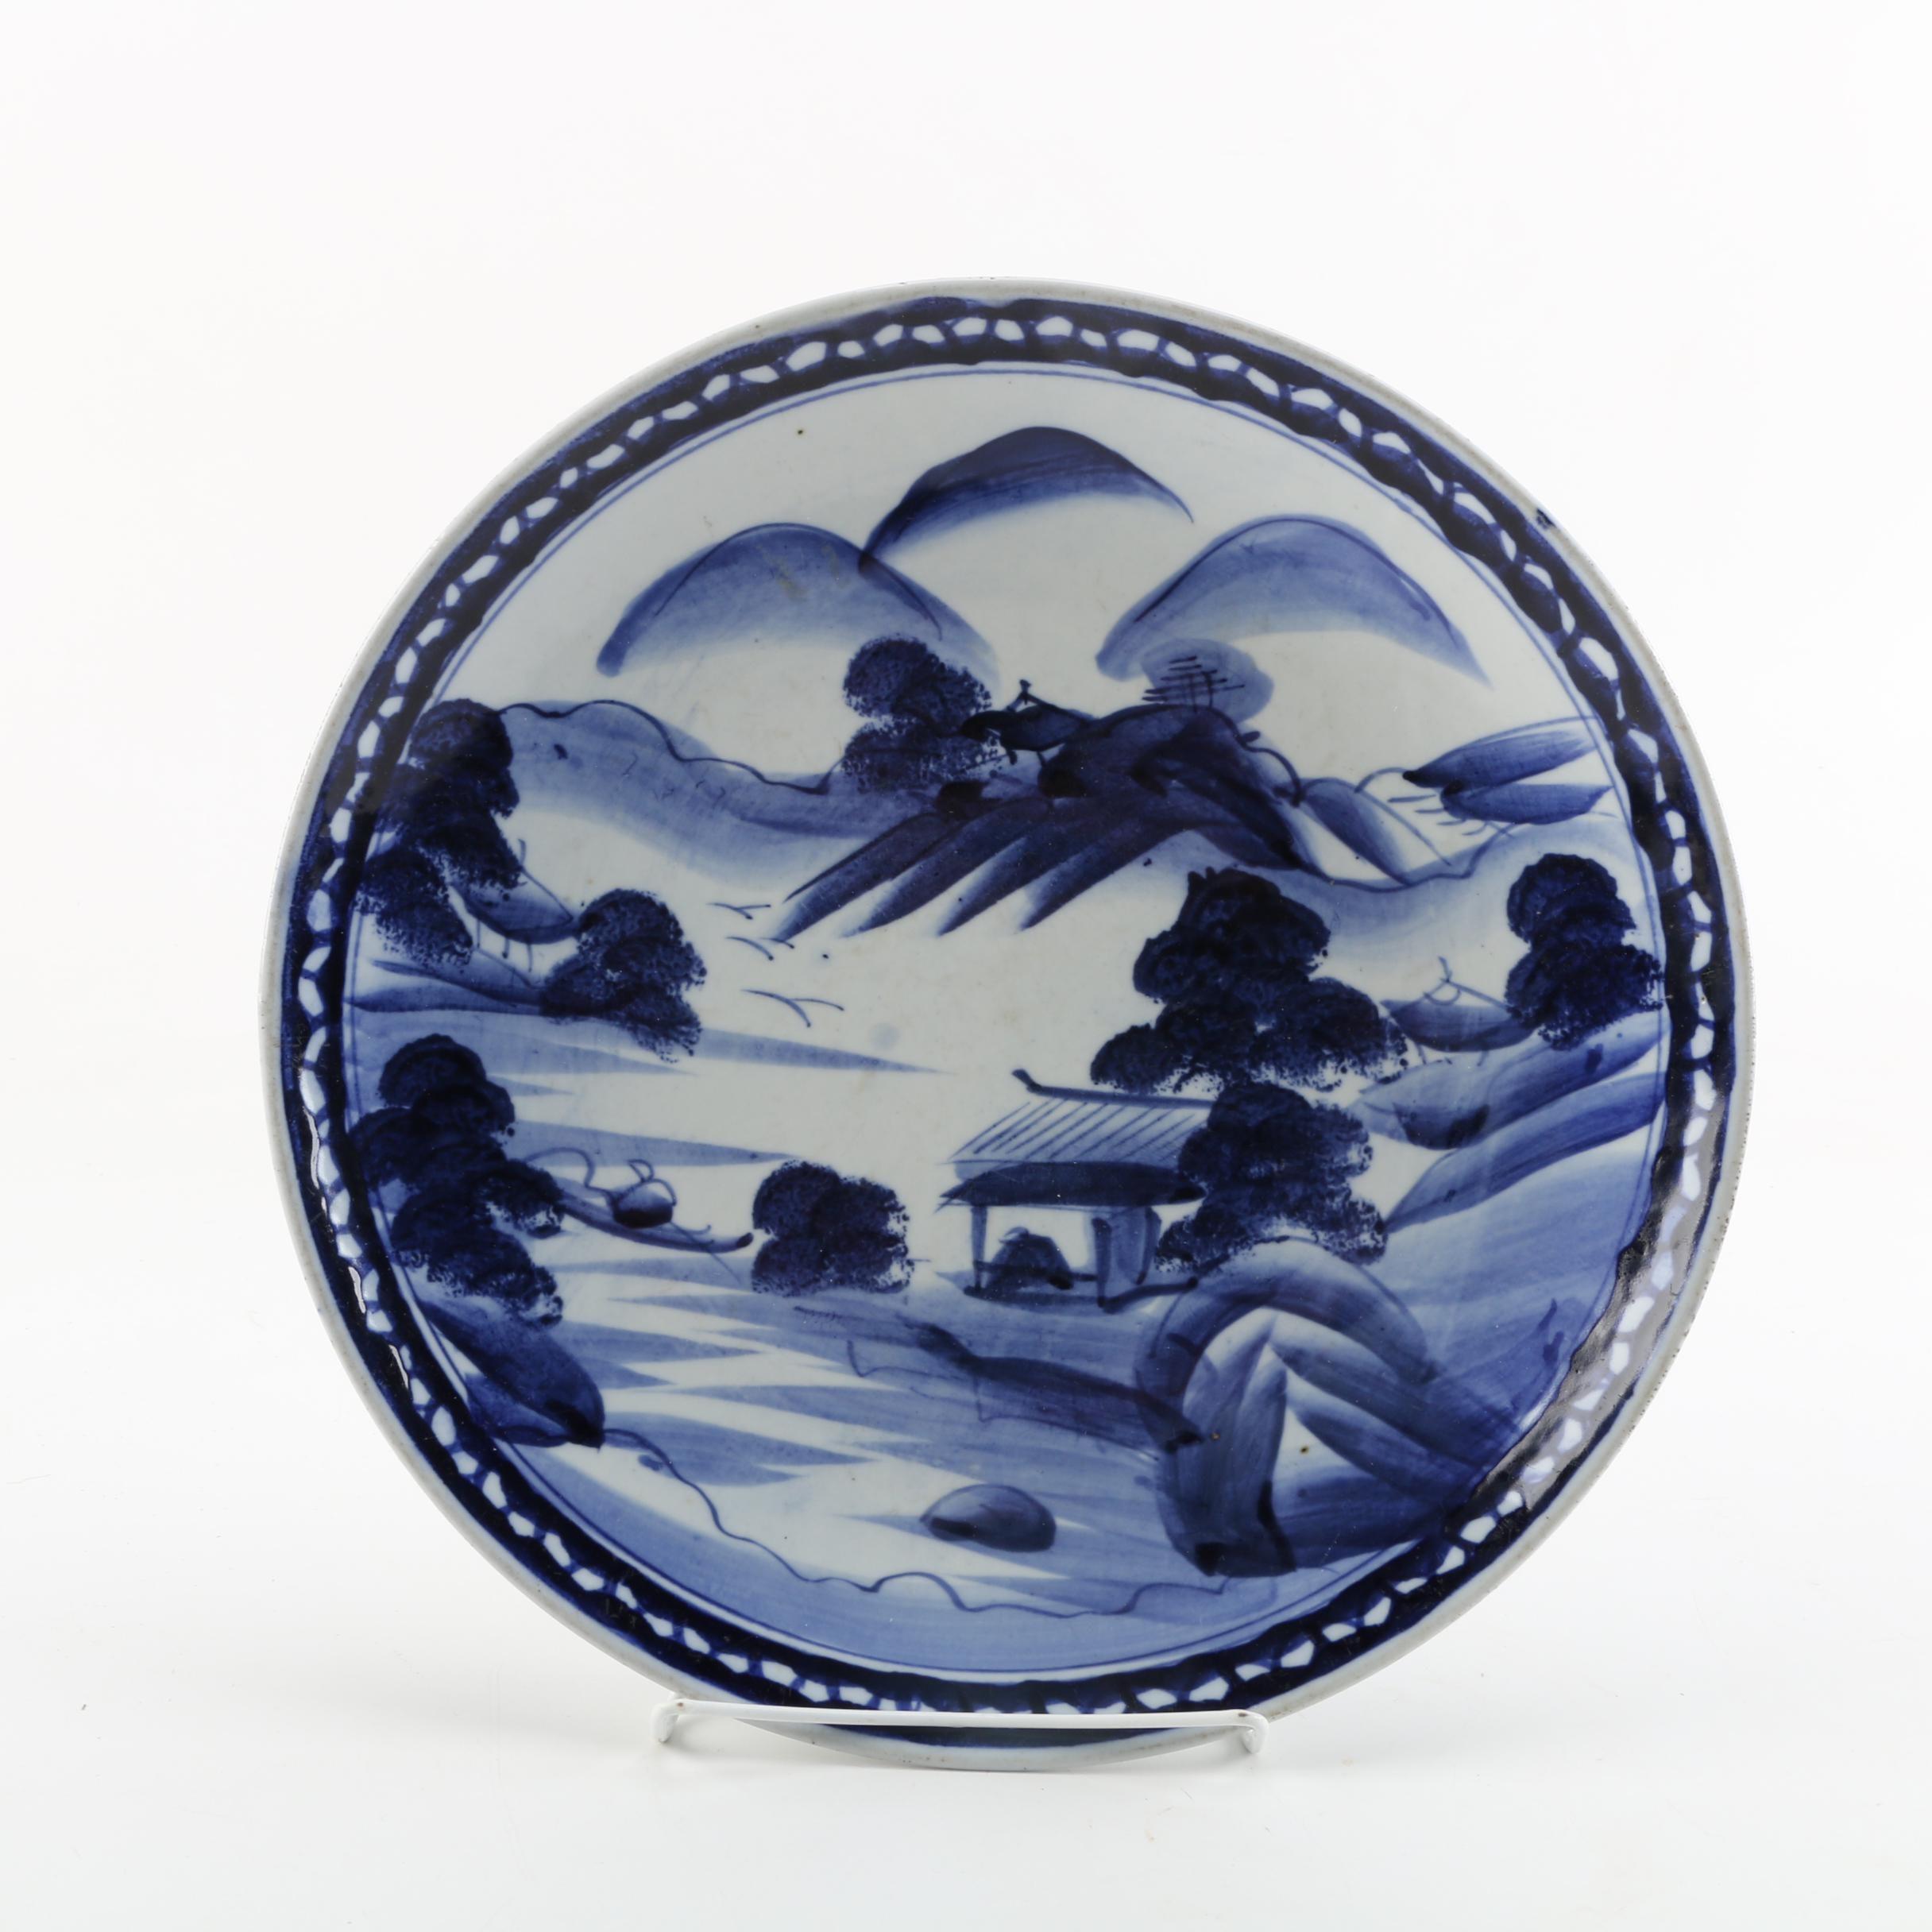 Antique Japanese Imari Plate ...  sc 1 st  EBTH.com & Antique Japanese Imari Plate : EBTH